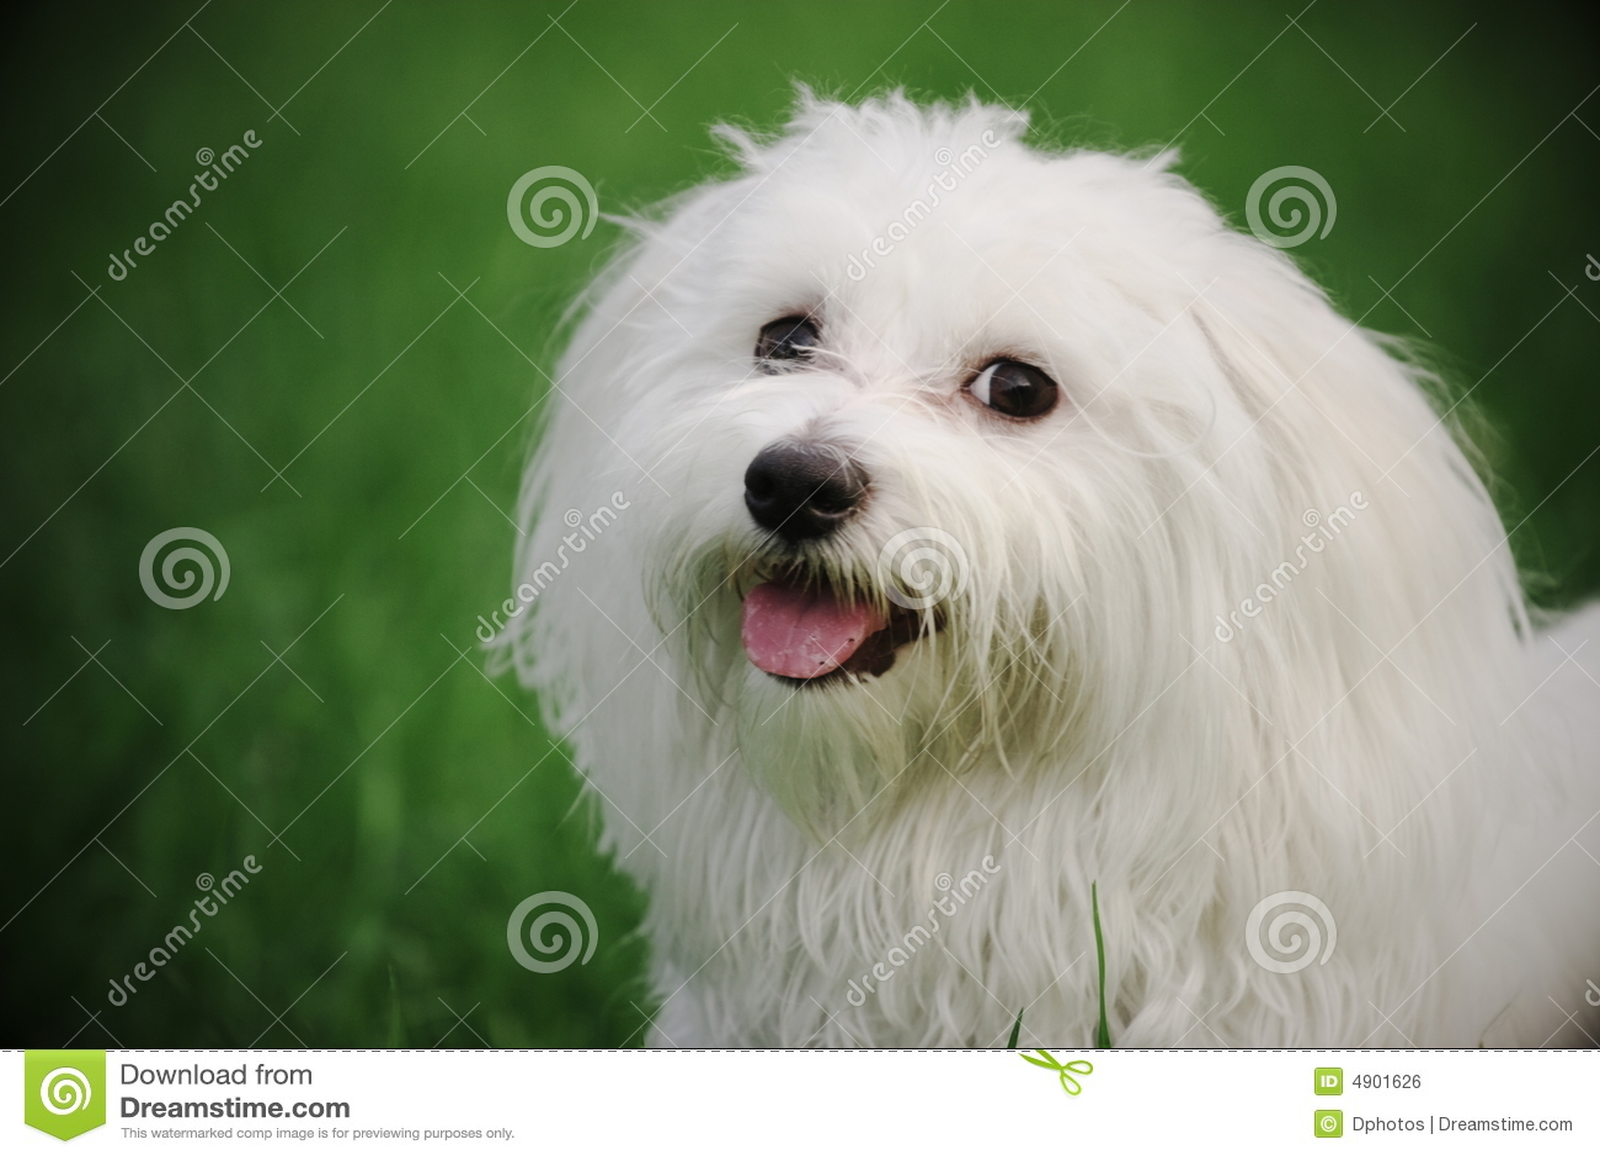 free clipart maltese dog - photo #49